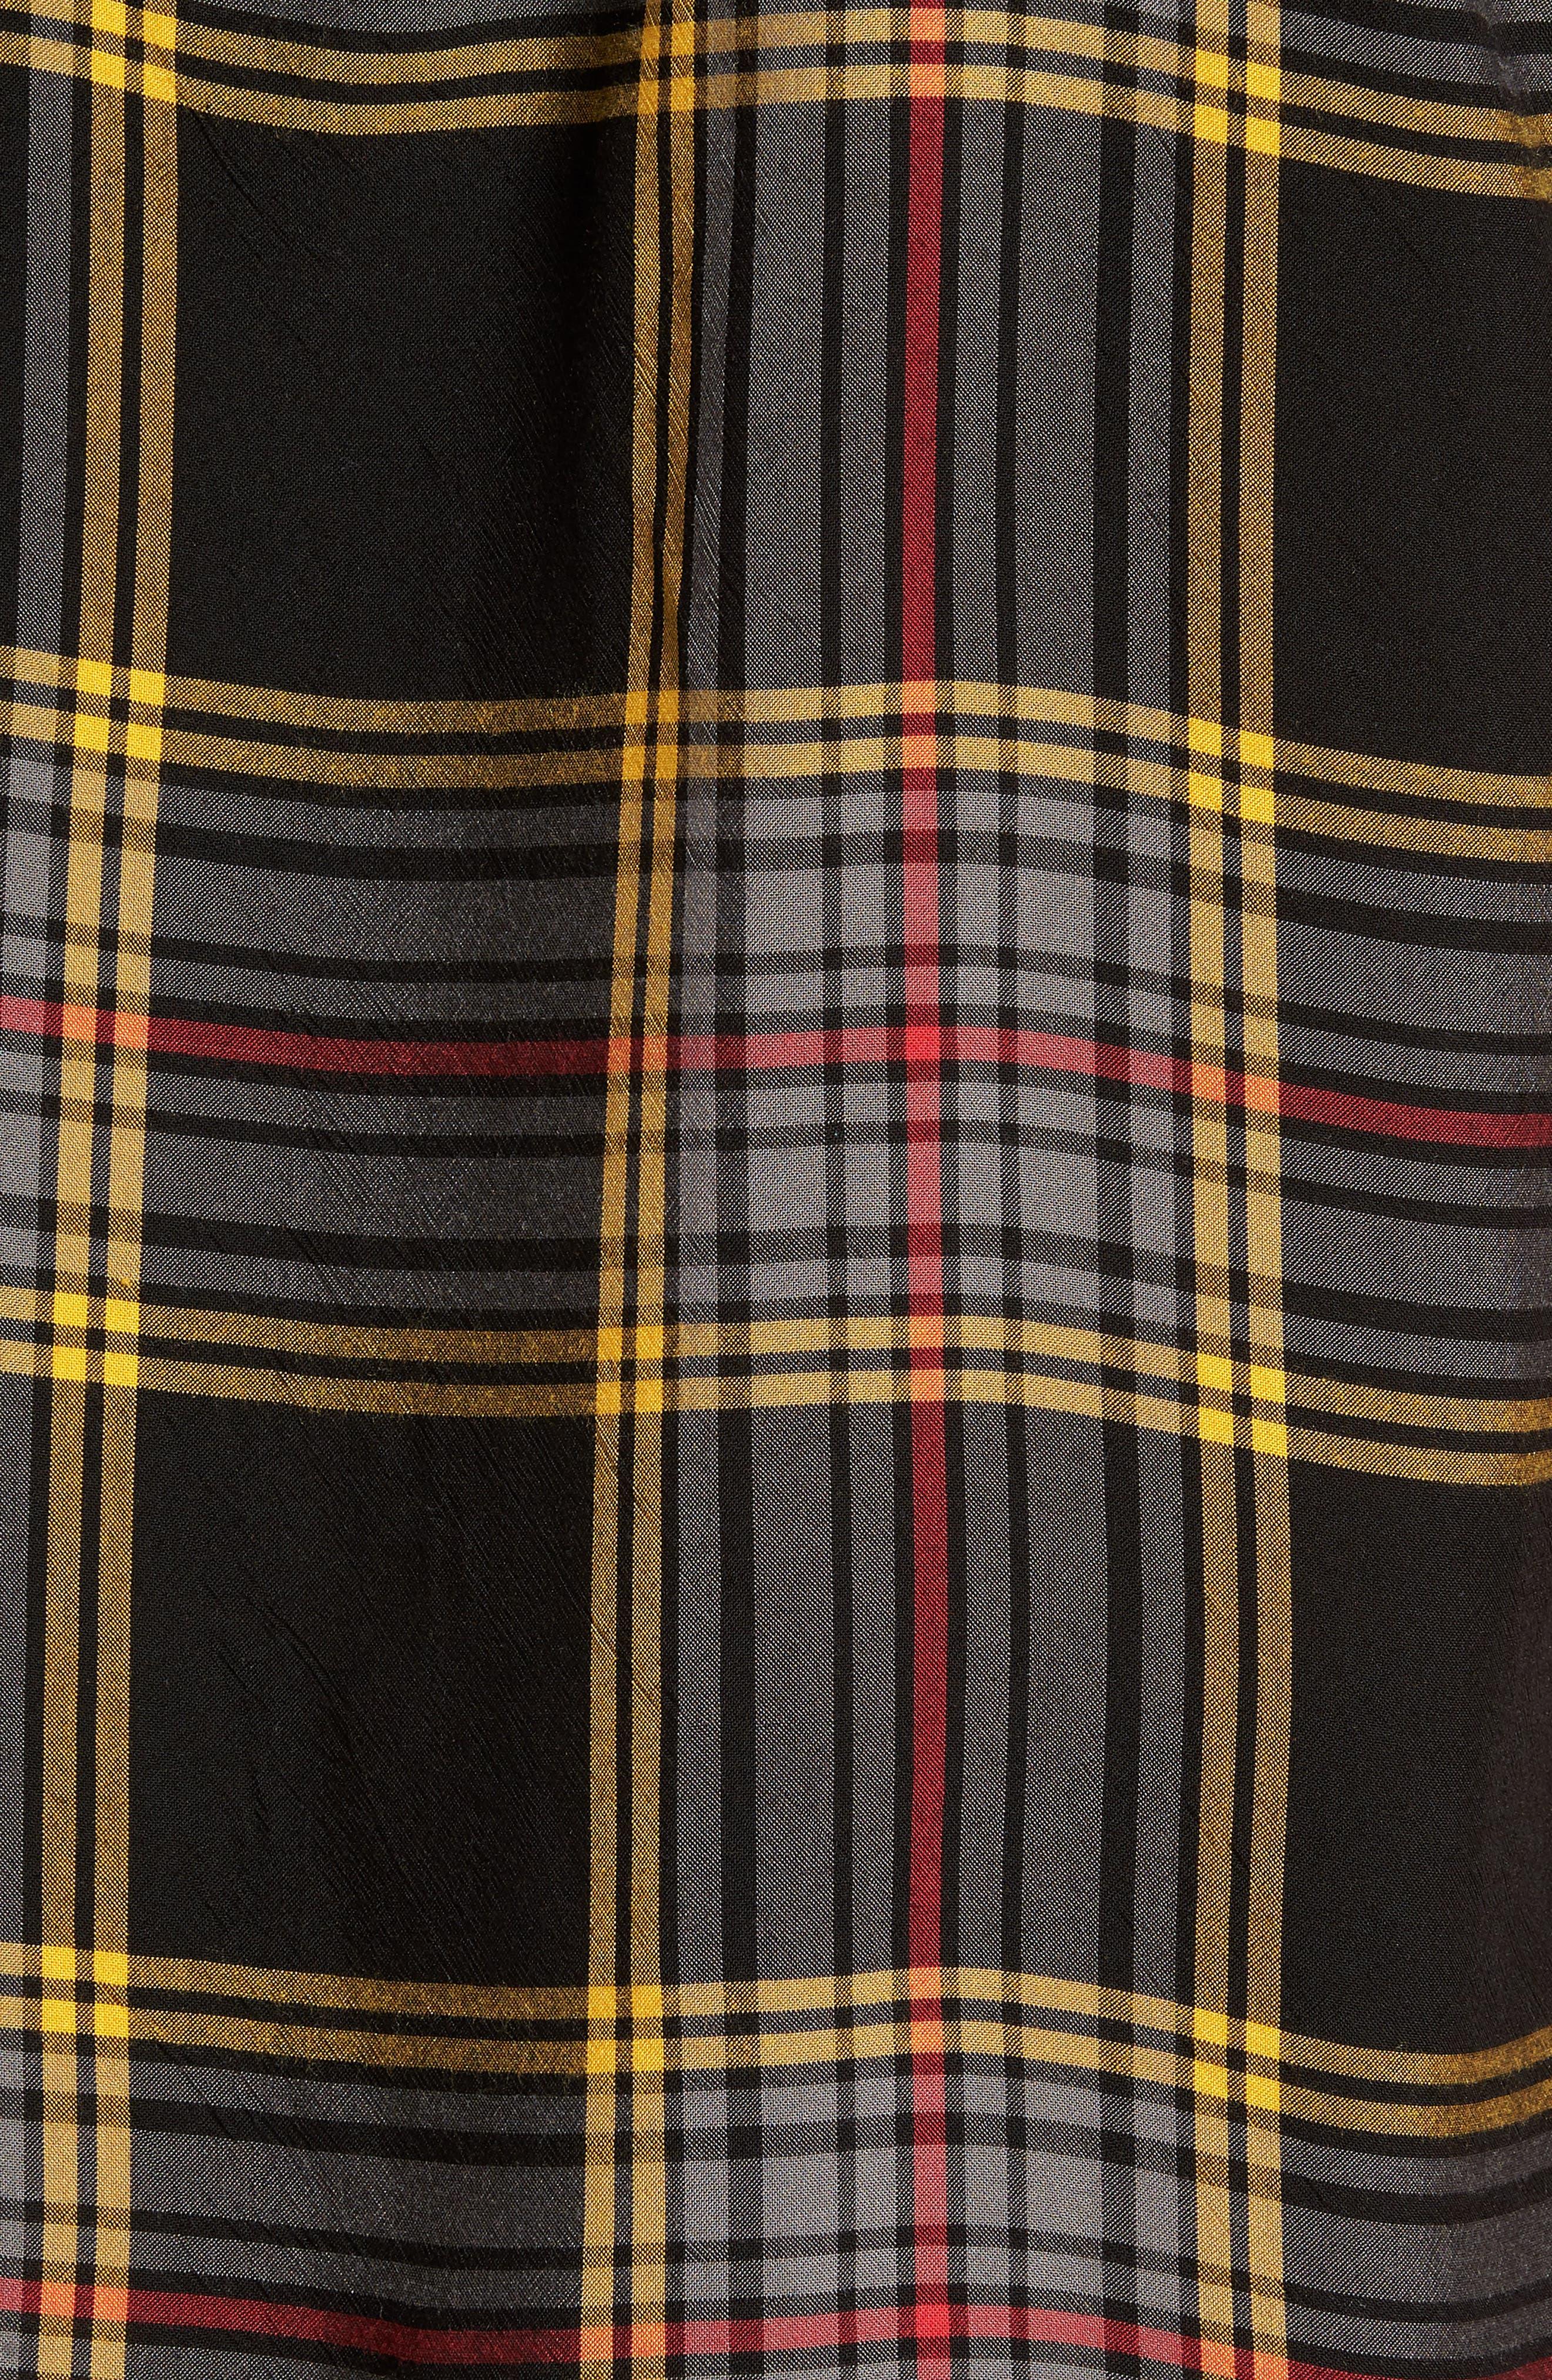 Yarn Dyed Plaid Shirt,                             Alternate thumbnail 5, color,                             Black Yellow Ethan Plaid